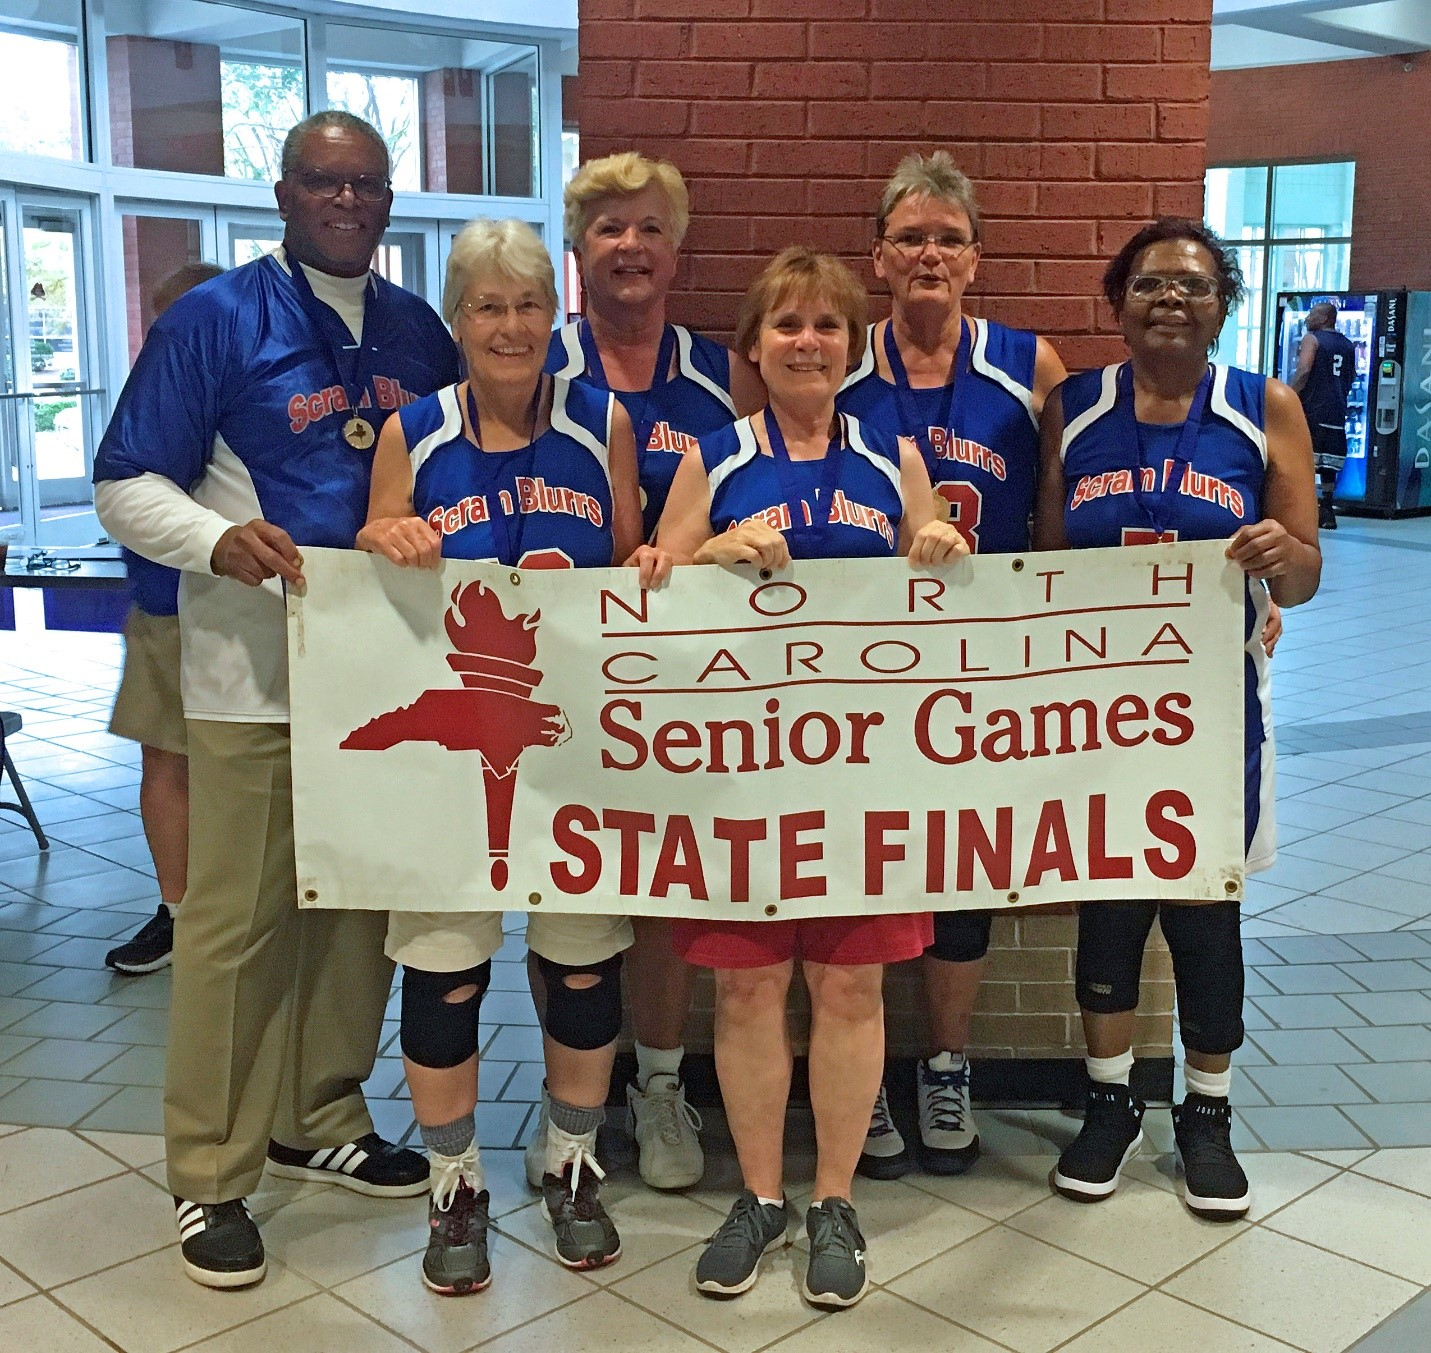 ScramBlurrs team (left to right) includes: Coach Edward Cochrane-Brown, teammates Catherine Matthews, Suzette Stroud, Linda Hall, Janice Jackson and Juanita Green.